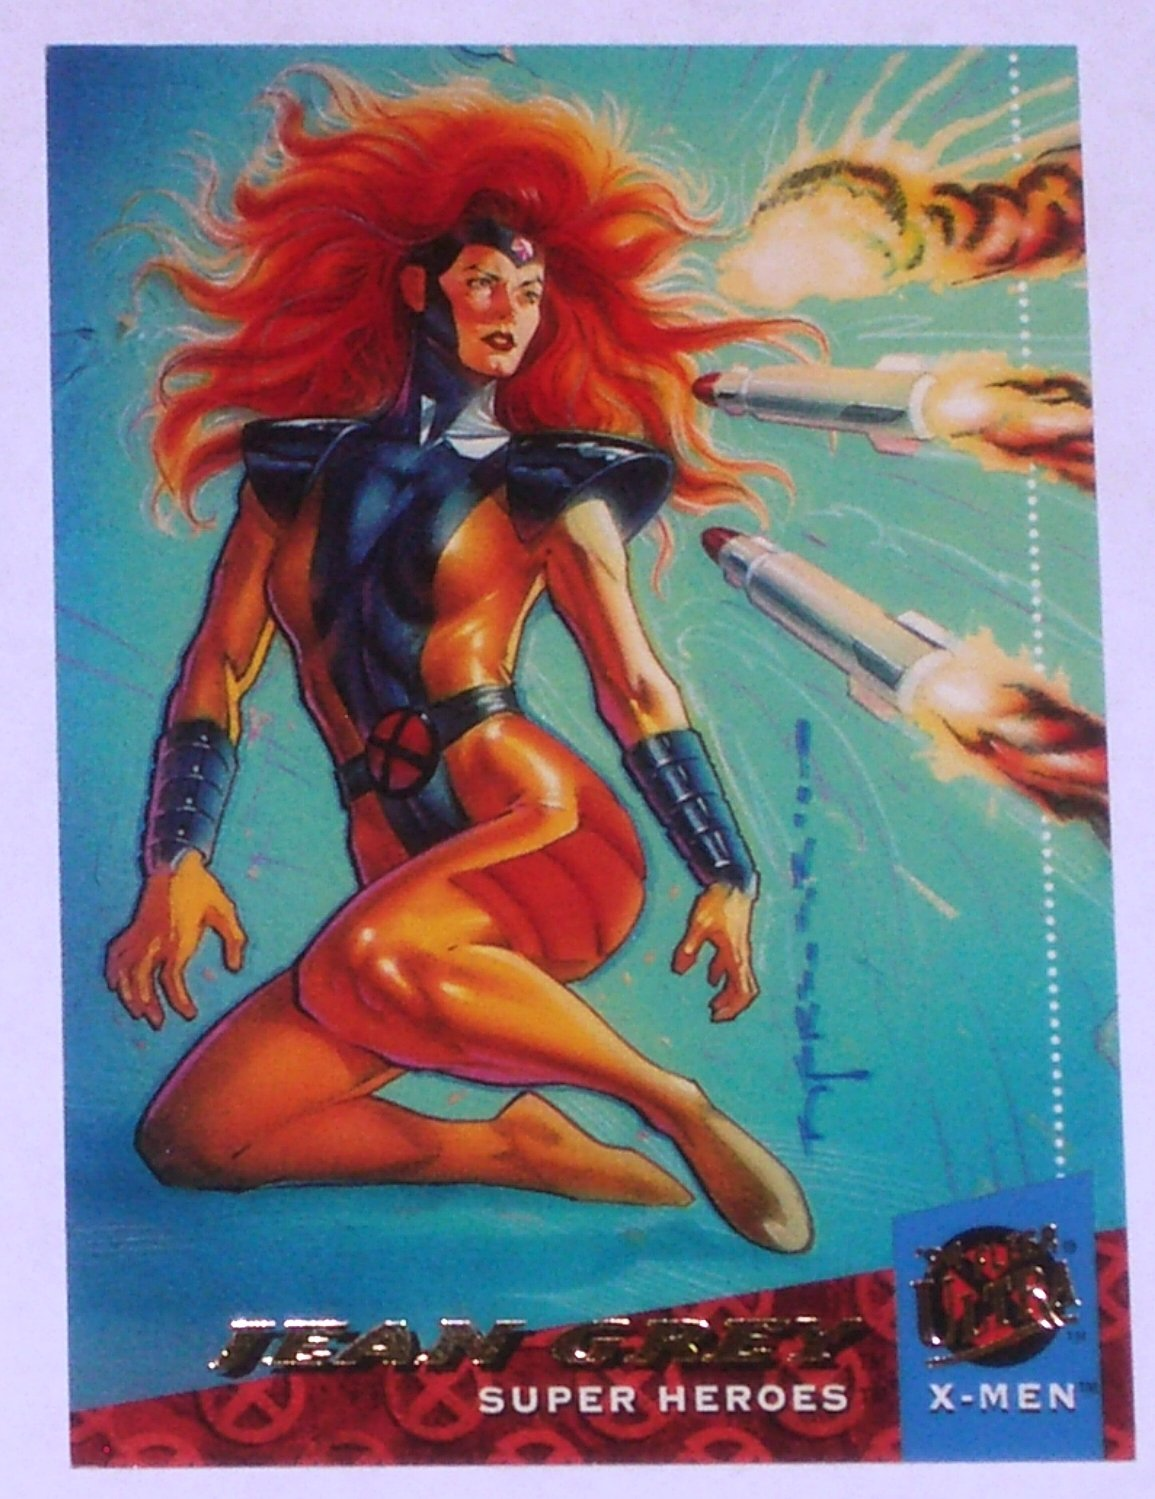 JEAN GREY '94 Fleer Ultra X-Men Super Heroes Trading Card Marvel Comics #14